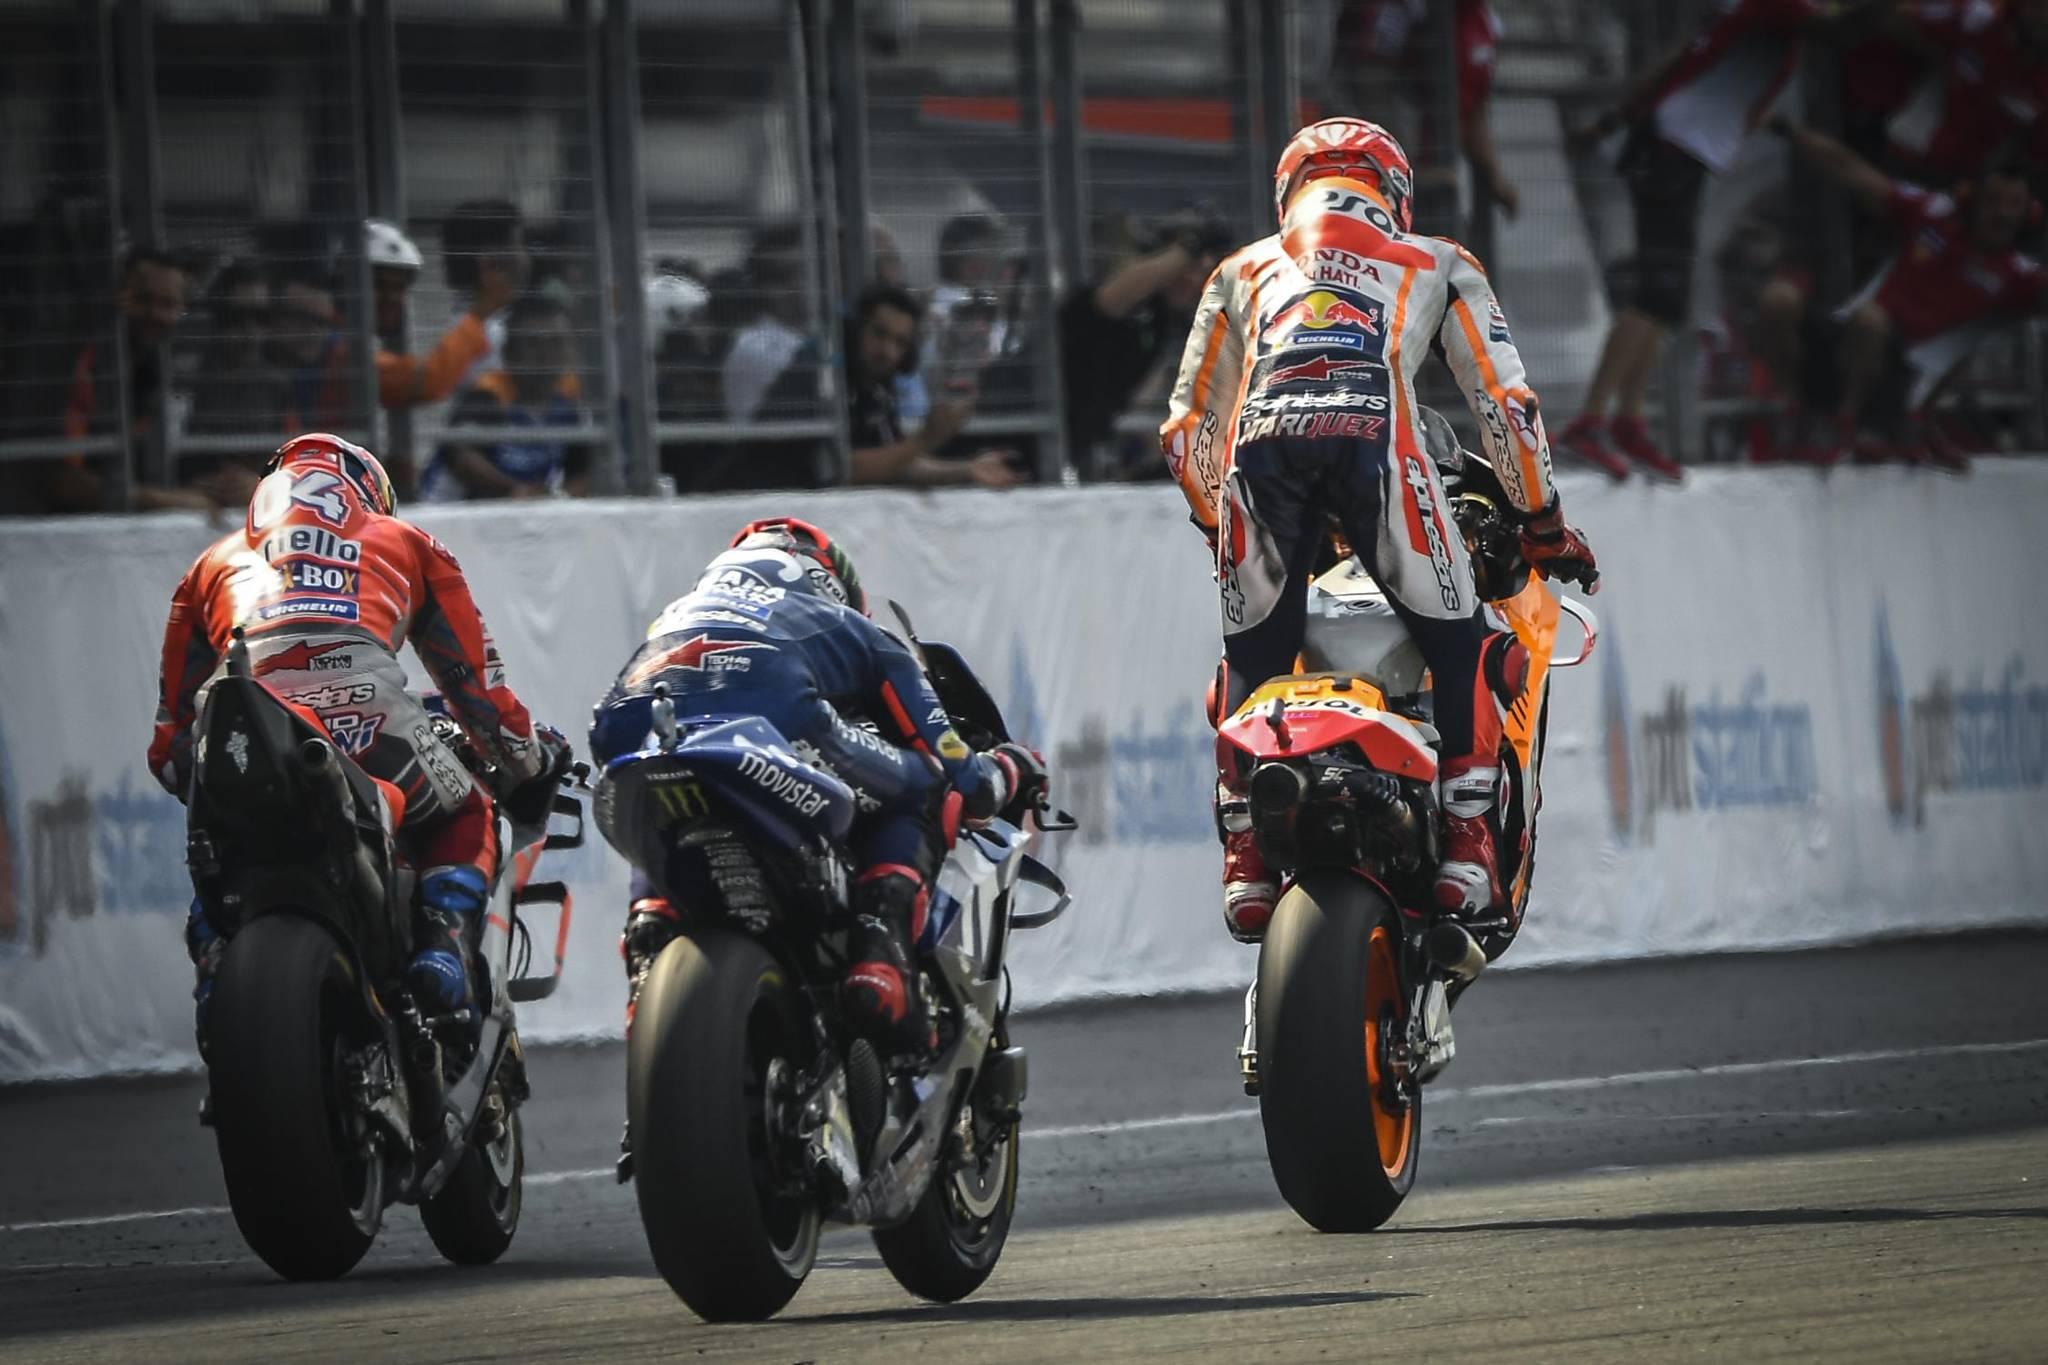 Moto_GP_2018_Thai_GP_Xe_Tinhte_006.jpg